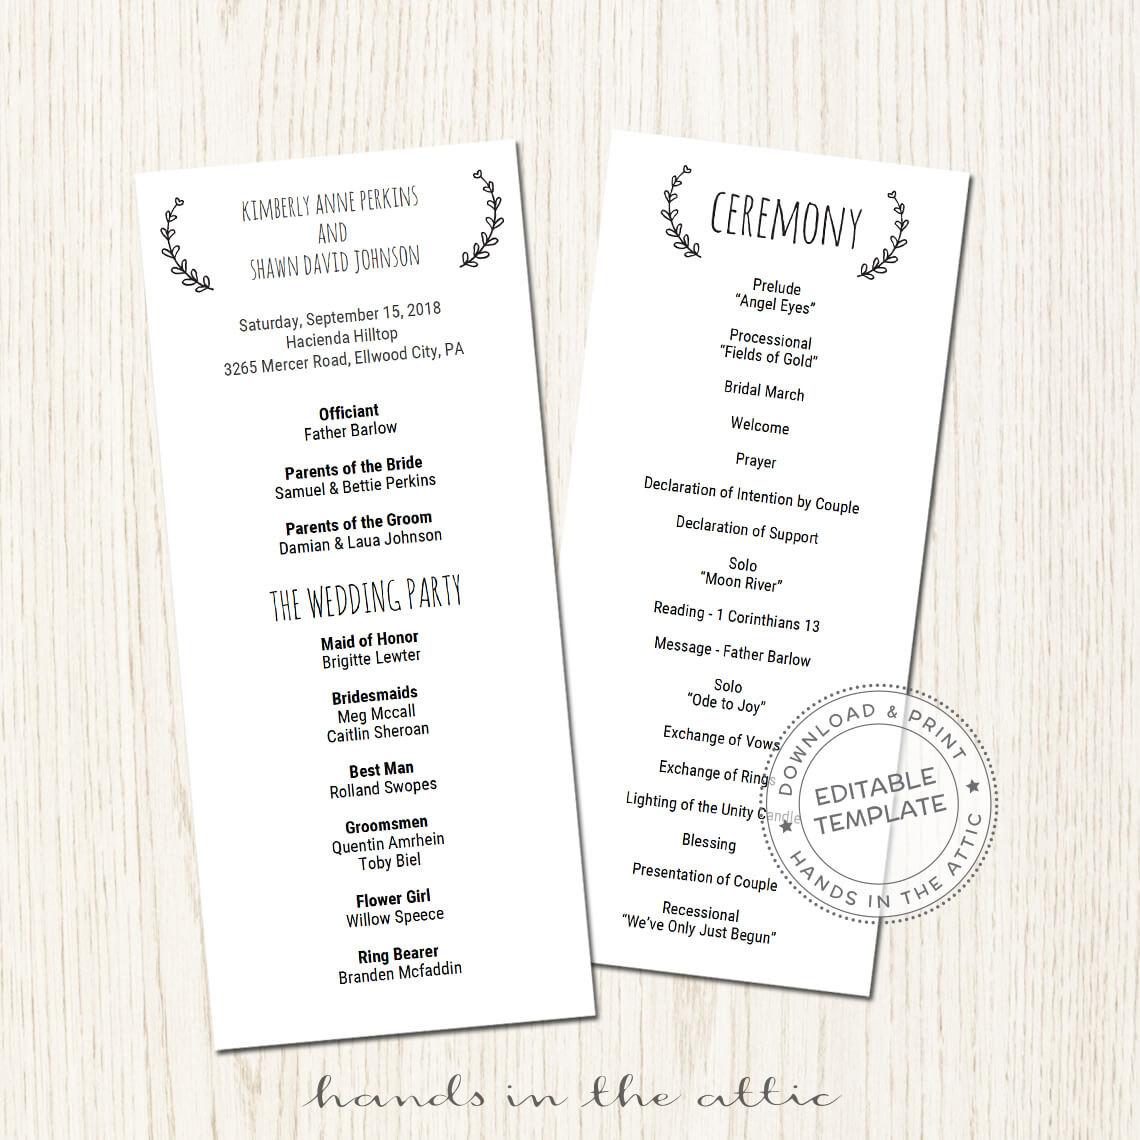 Programs: Basic Wedding Program